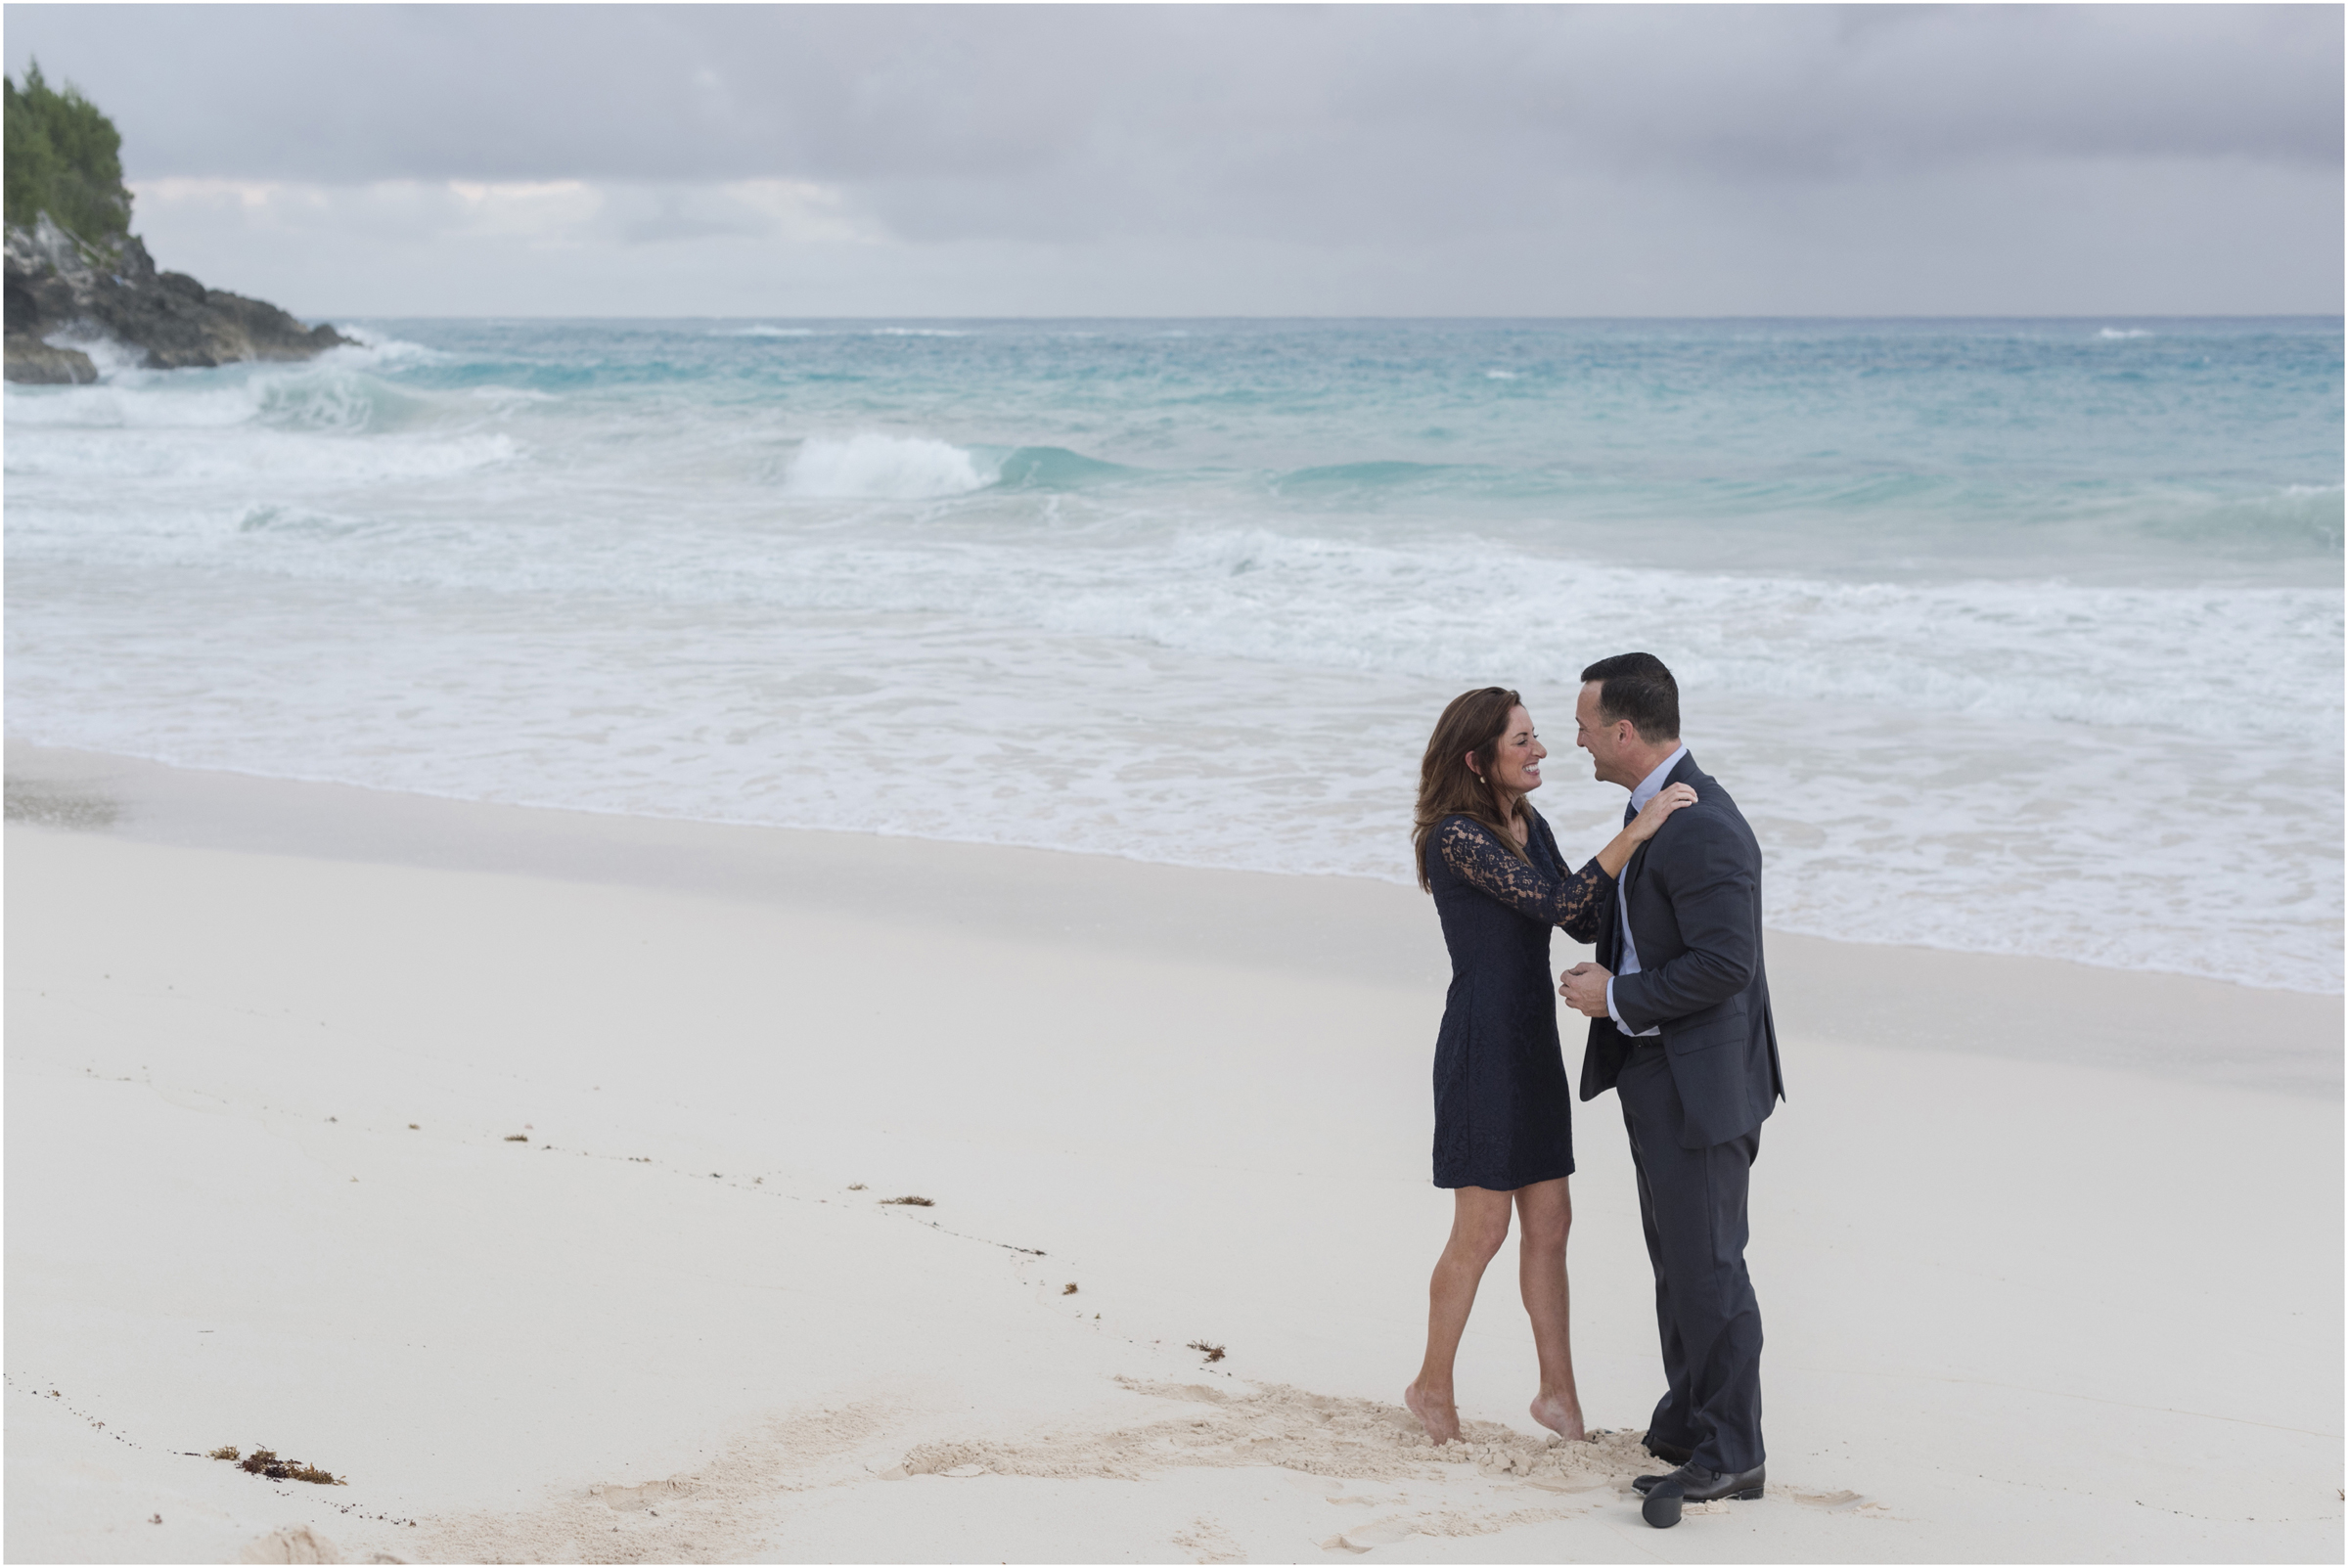 ©FianderFoto_Engagement_Doug_Mary_6.jpg